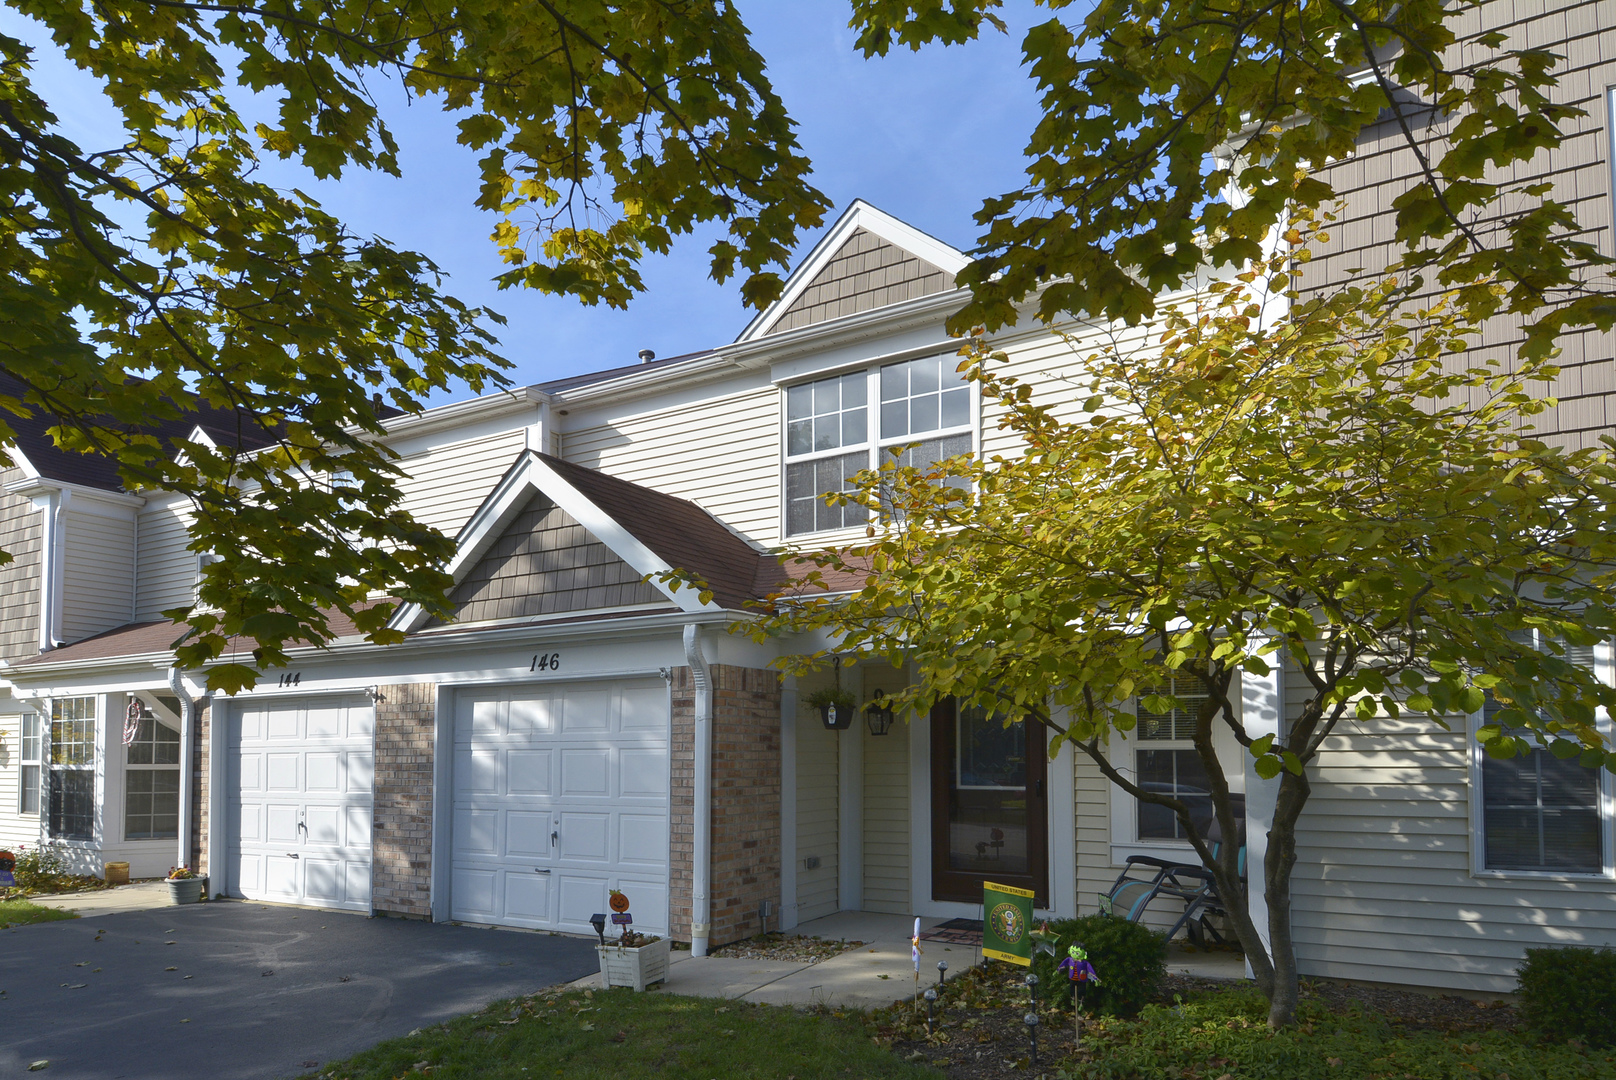 146 N Oltendorf Road, Streamwood, IL 60107